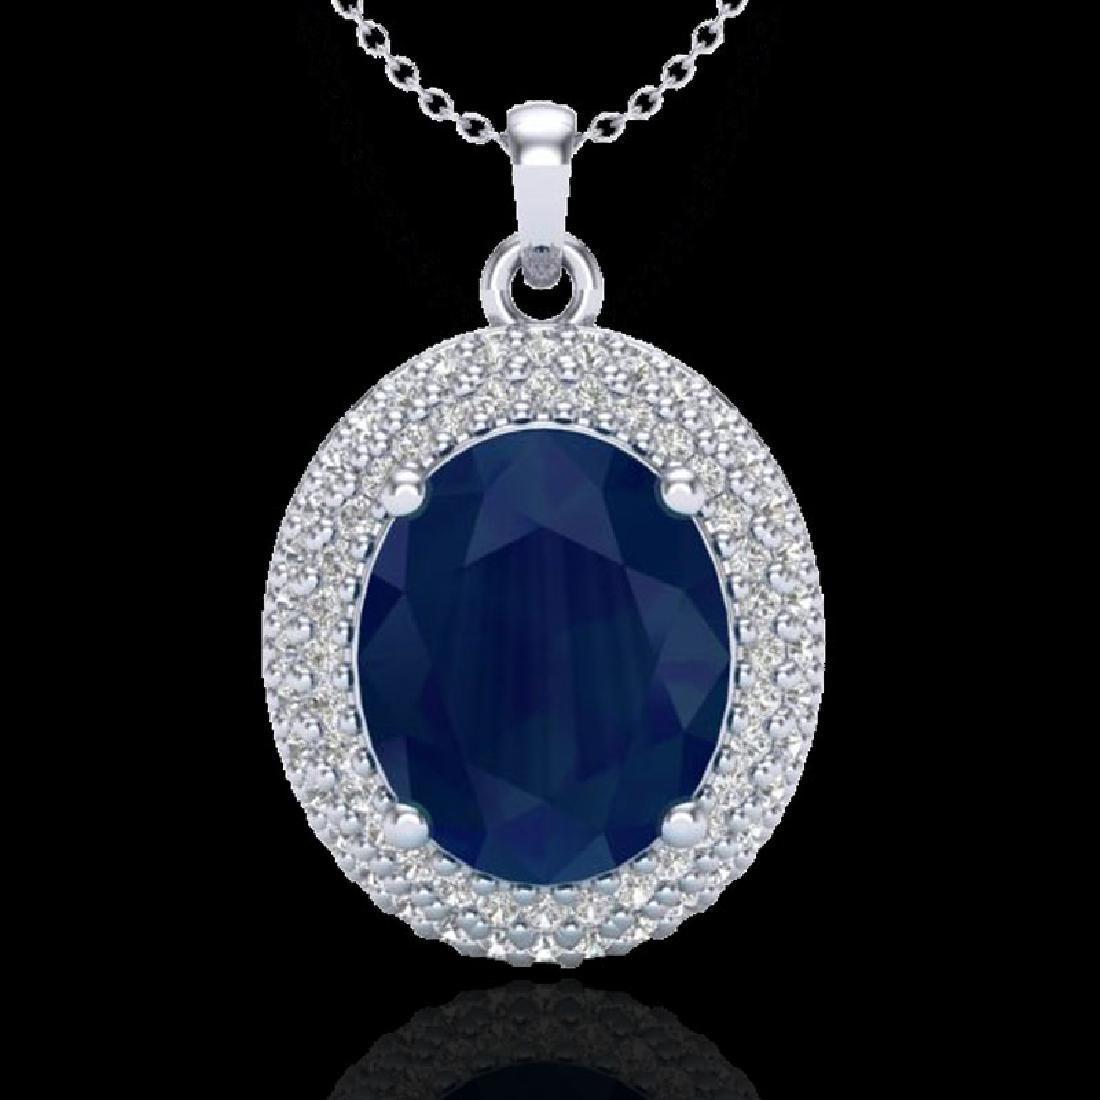 4.50 CTW Sapphire & Micro Pave VS/SI Diamond Necklace